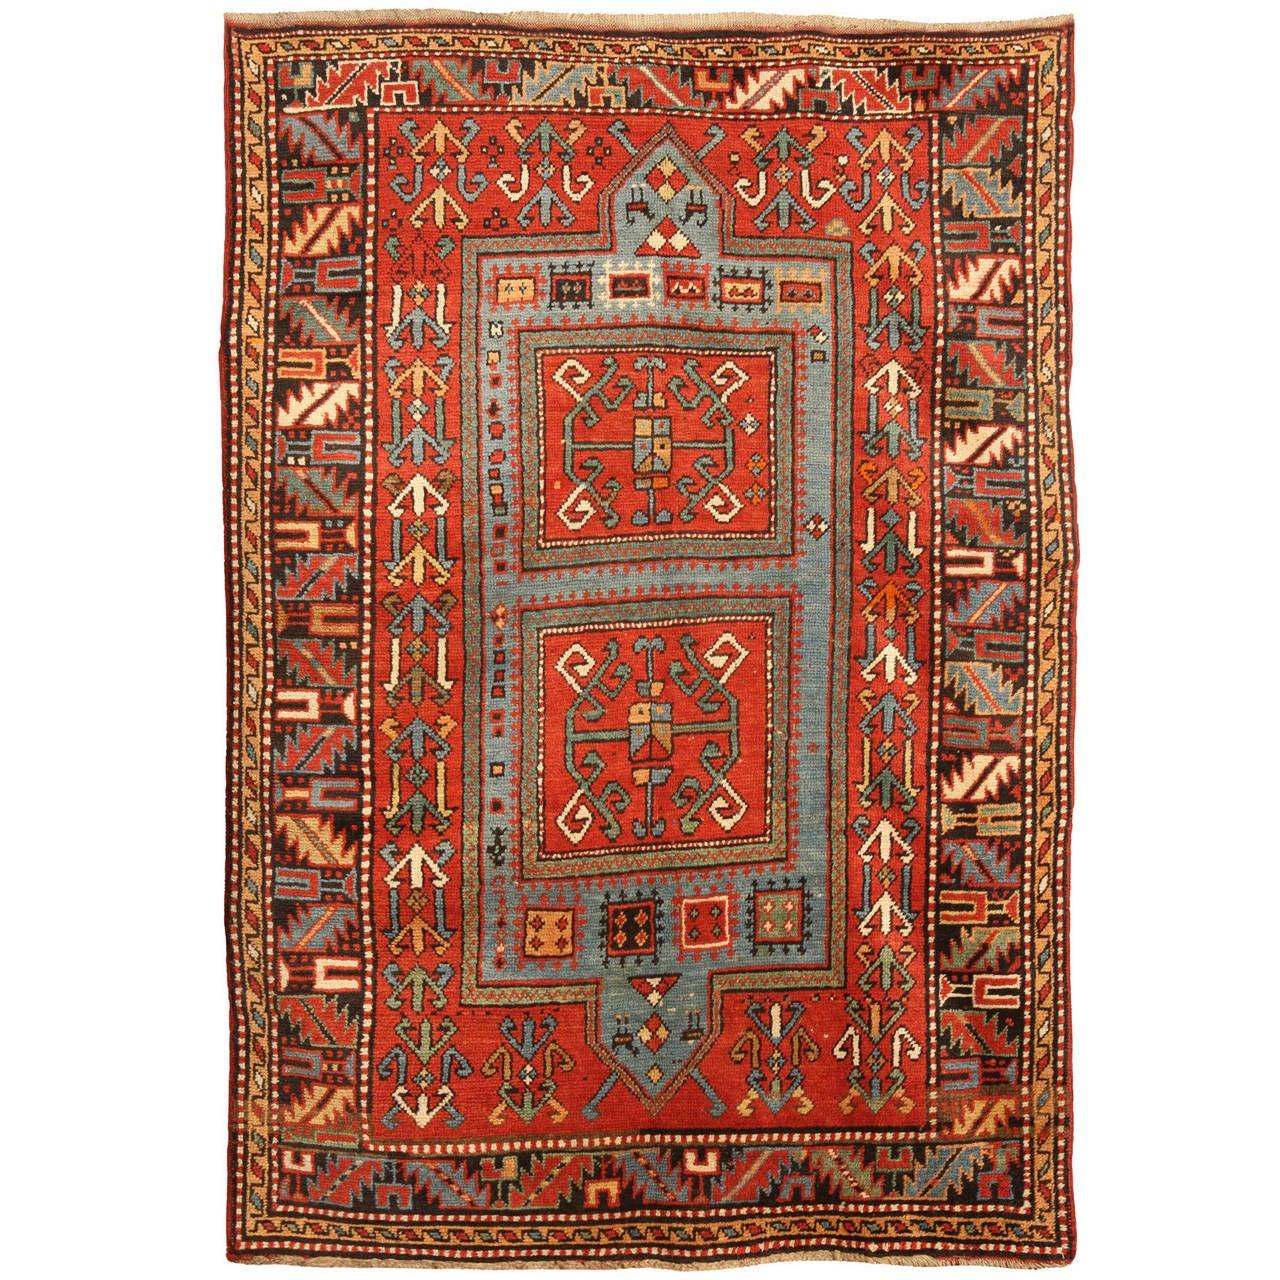 Antique Caucasian Kazak Rug For Sale At 1stdibs